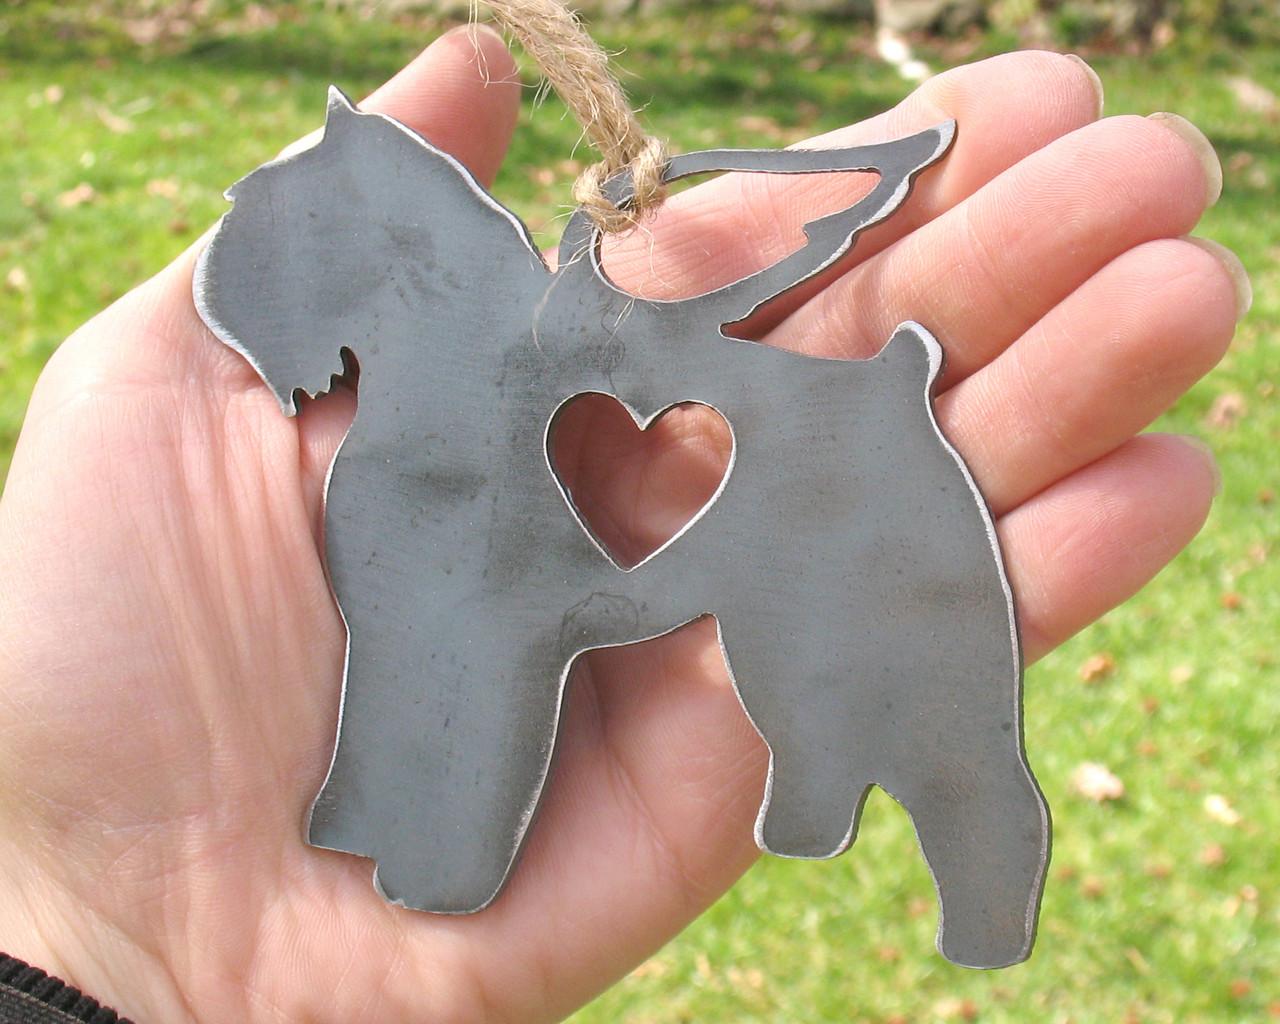 Bouvier Des Flandres Dog Ornament Pet Memorial W/ Angel Wings - Pet Loss Dog Sympathy Remembrance Gift - Metal Dog Christmas Ornament